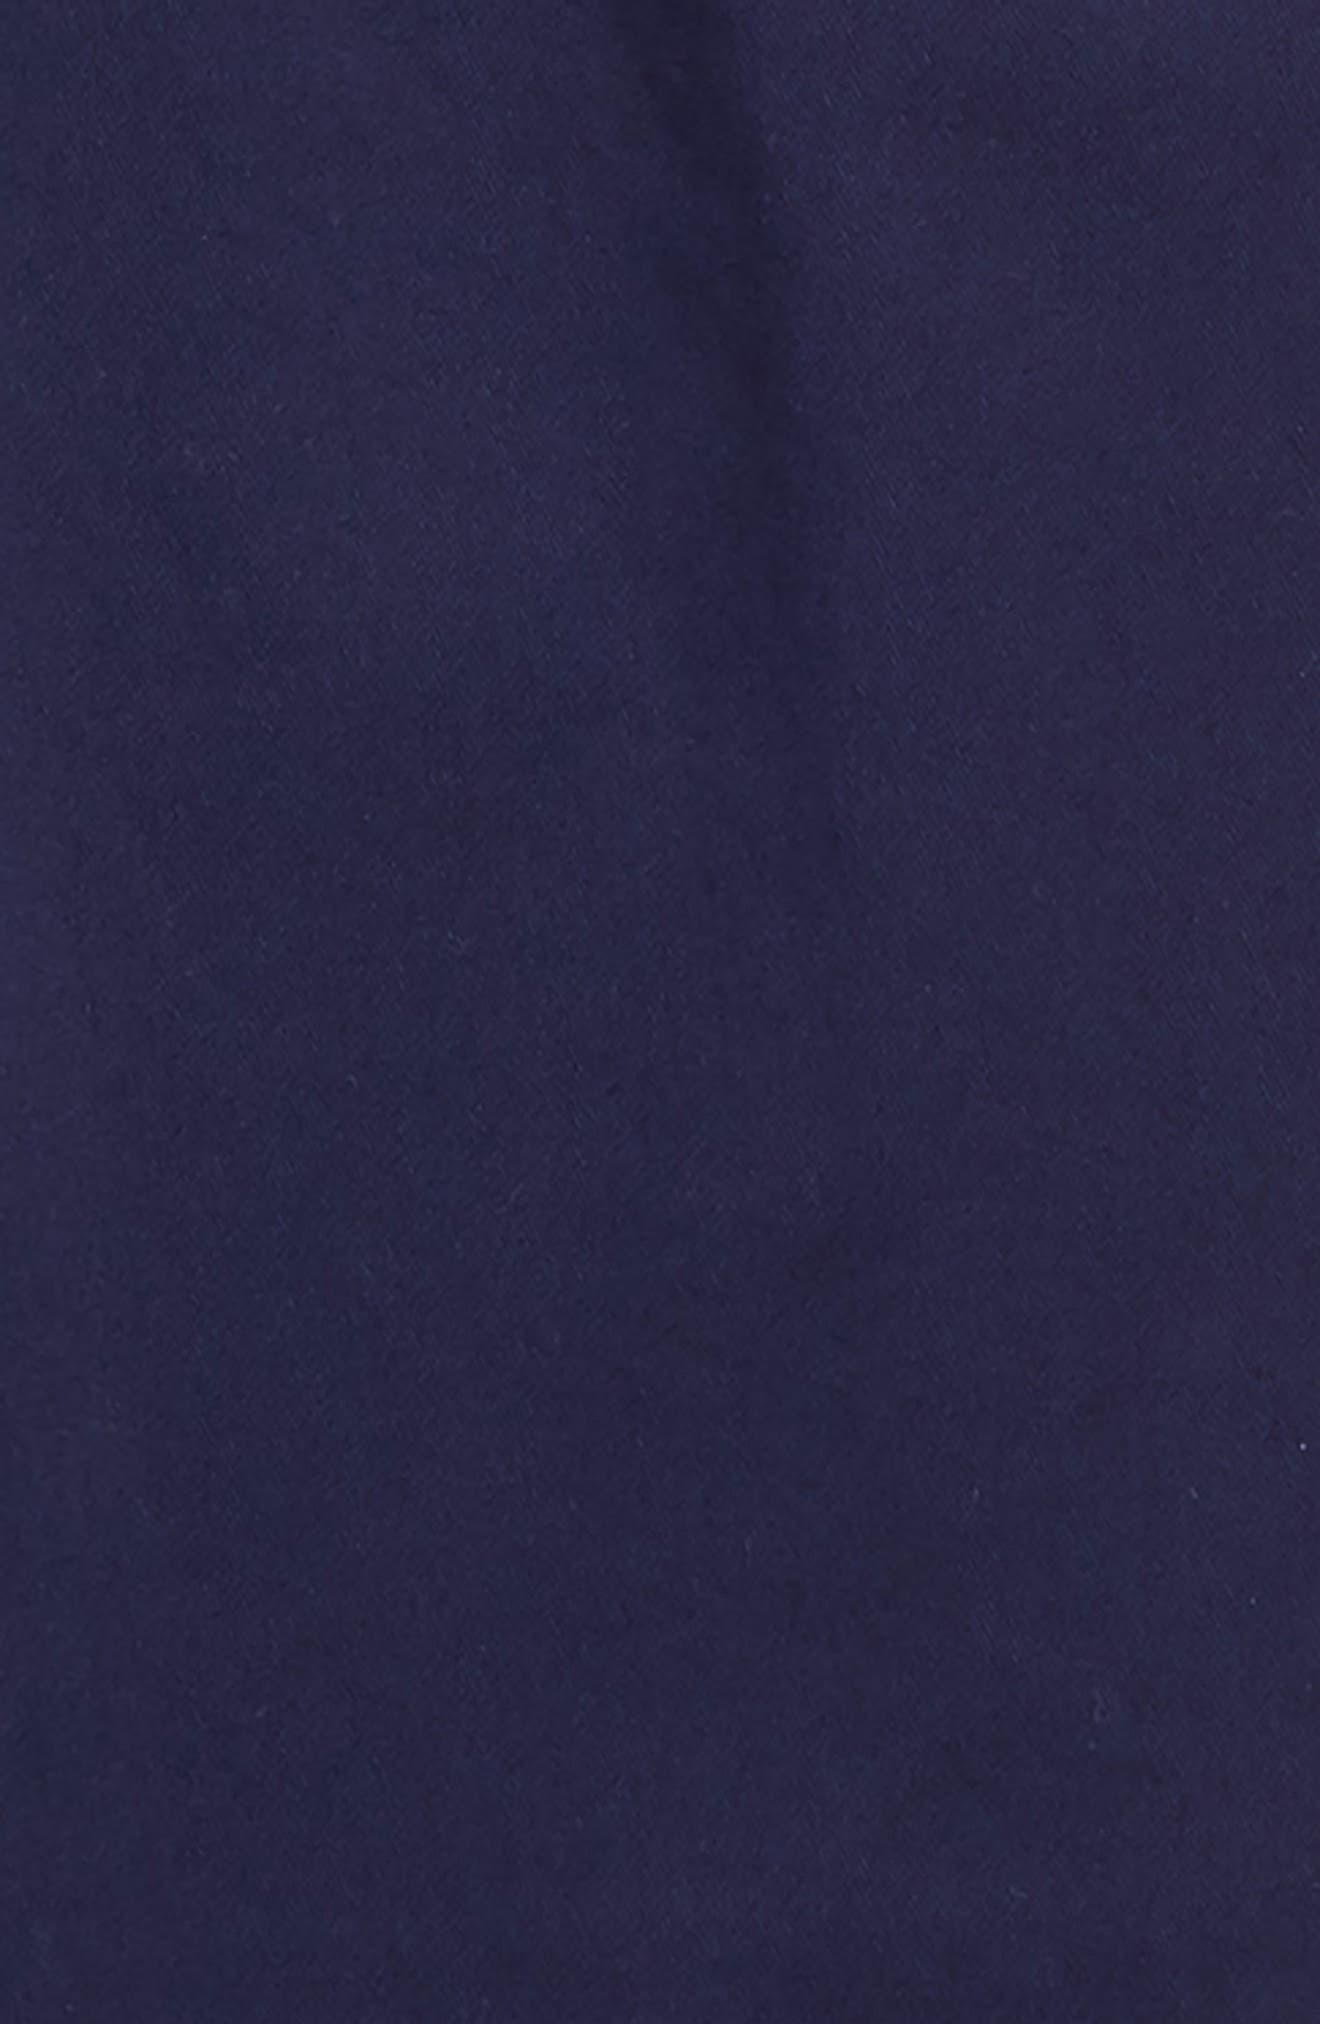 Chinos & Suspenders Set,                             Alternate thumbnail 2, color,                             Midnight